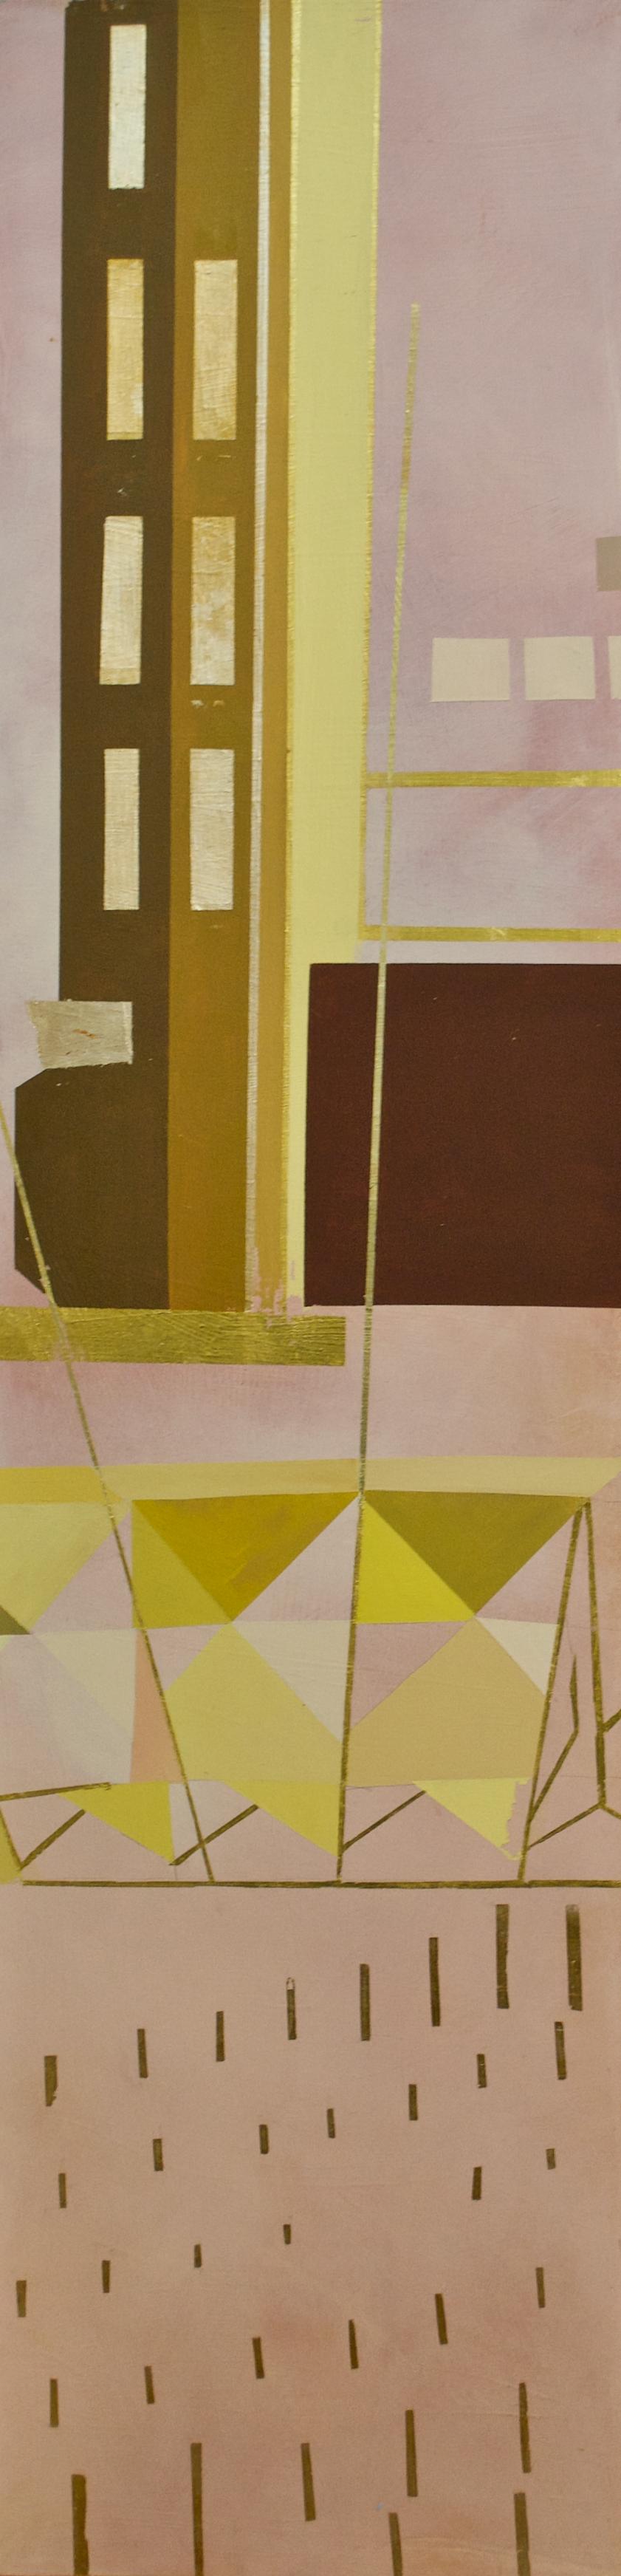 "Wonderwheel #38 - 40"" x 10"" oil and gold leaf on panel$1300"